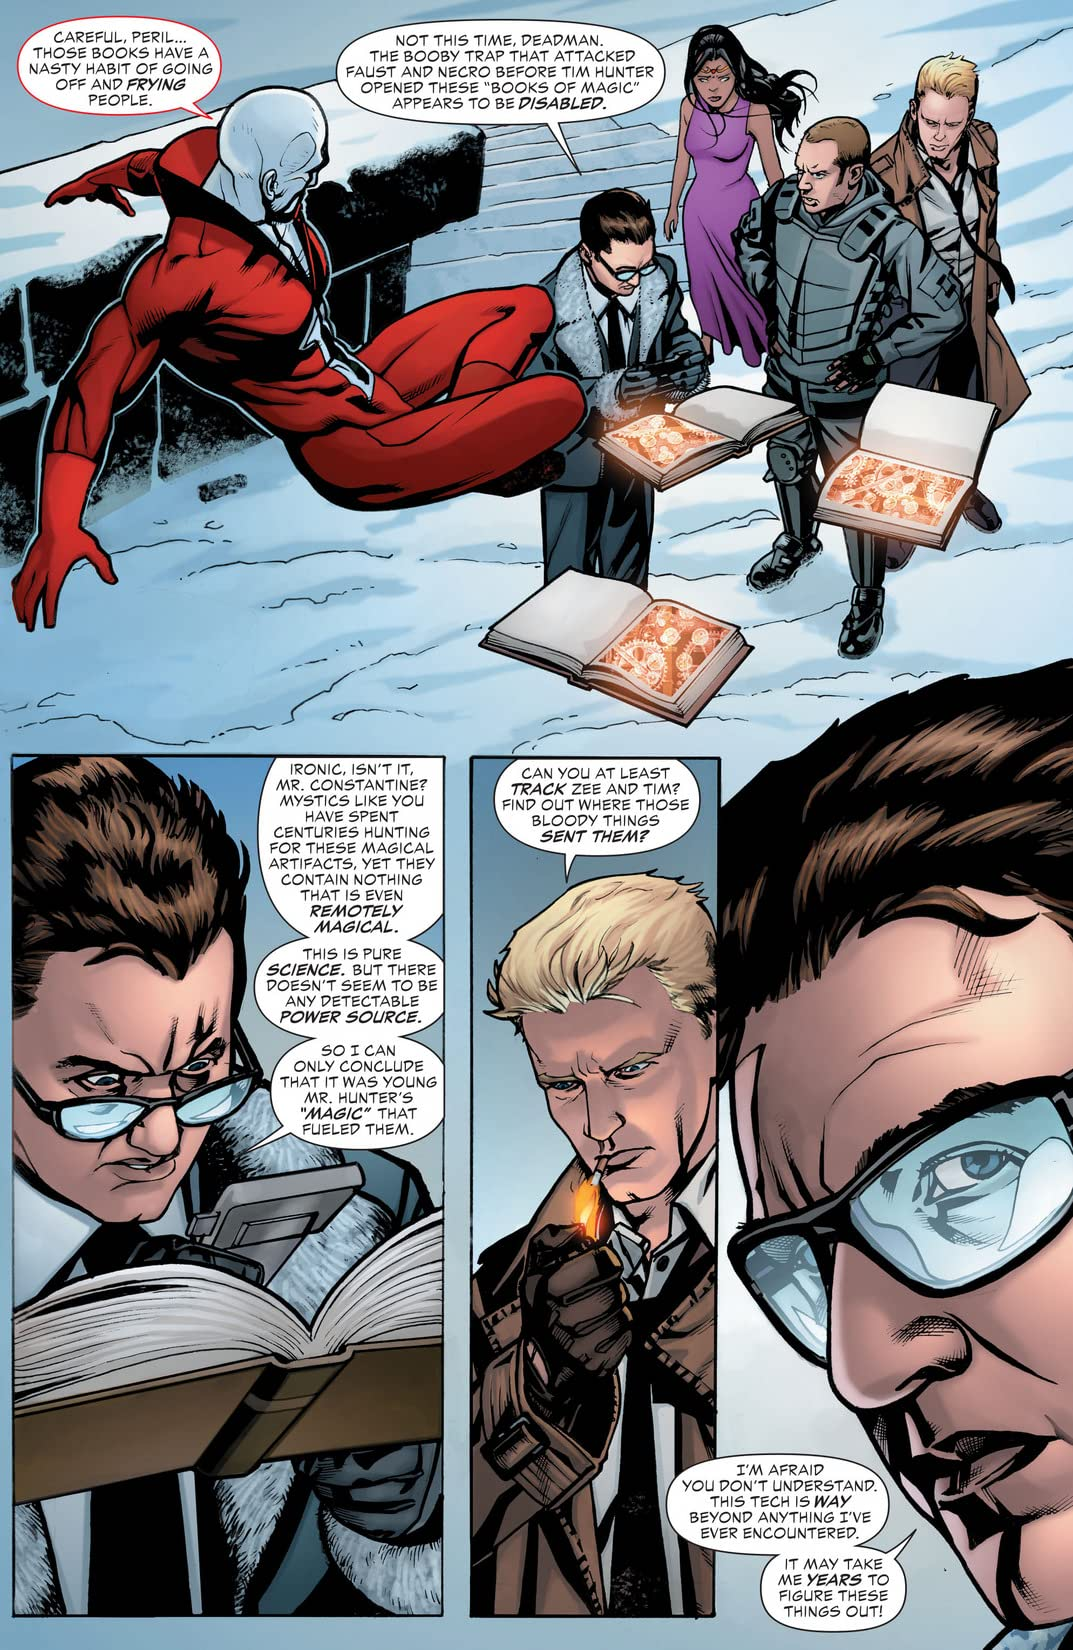 Justice League Dark (2011-2015) Vol. 3: The Death of Magic